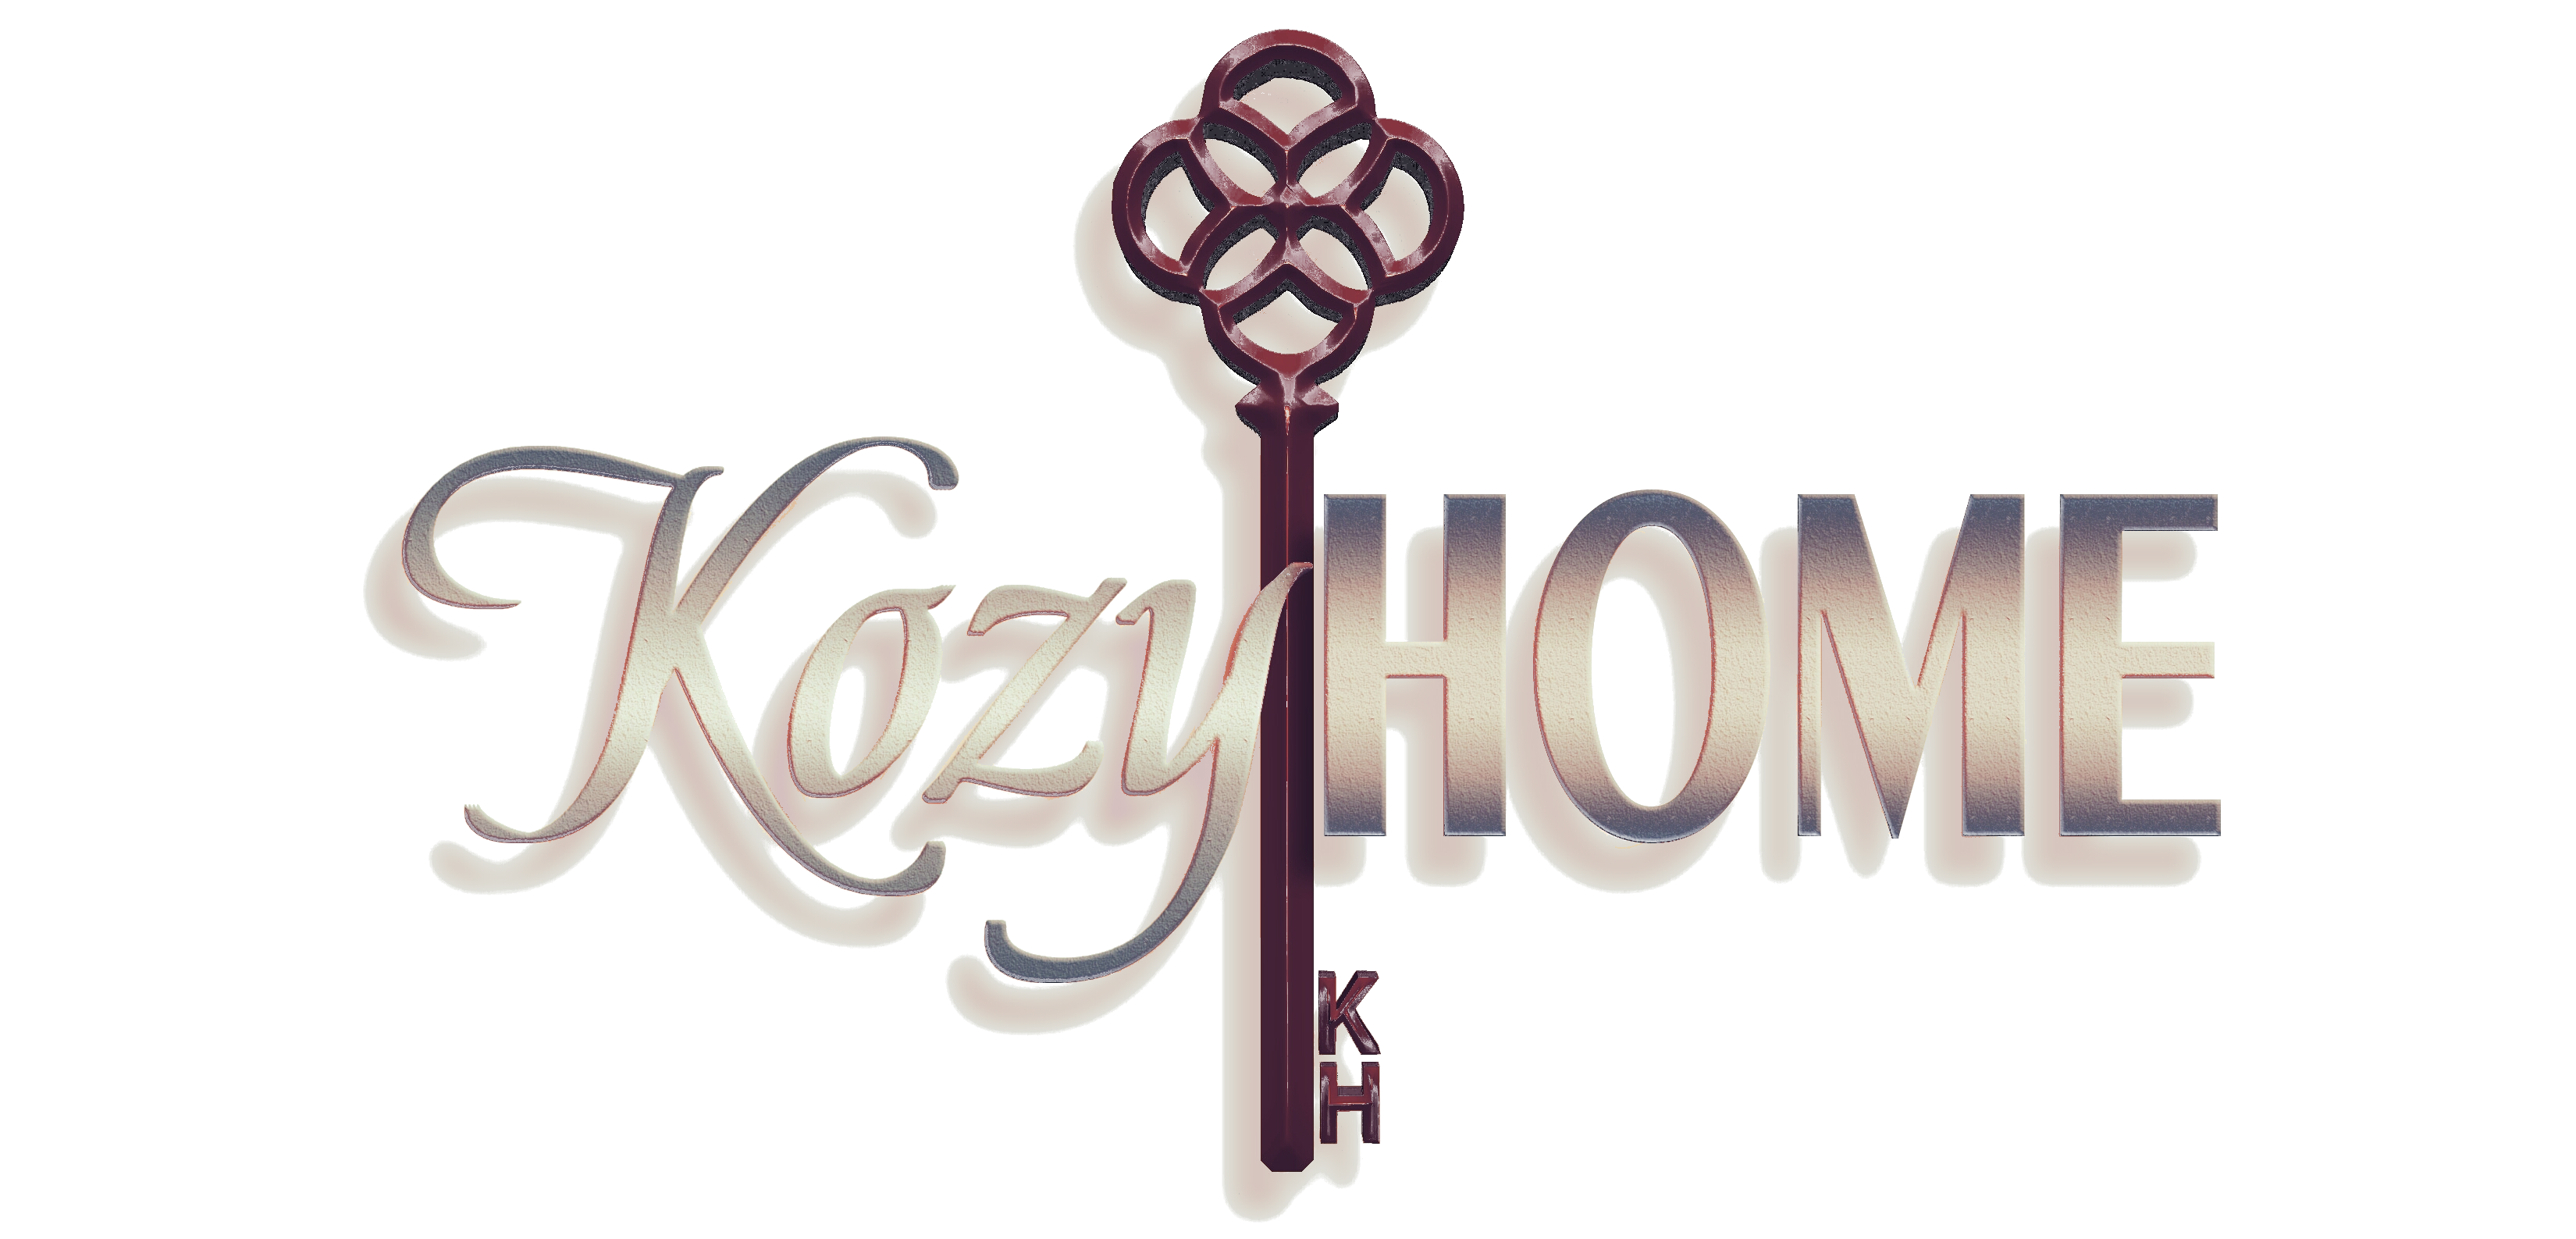 KozyHome ~ Albuquerque, NM